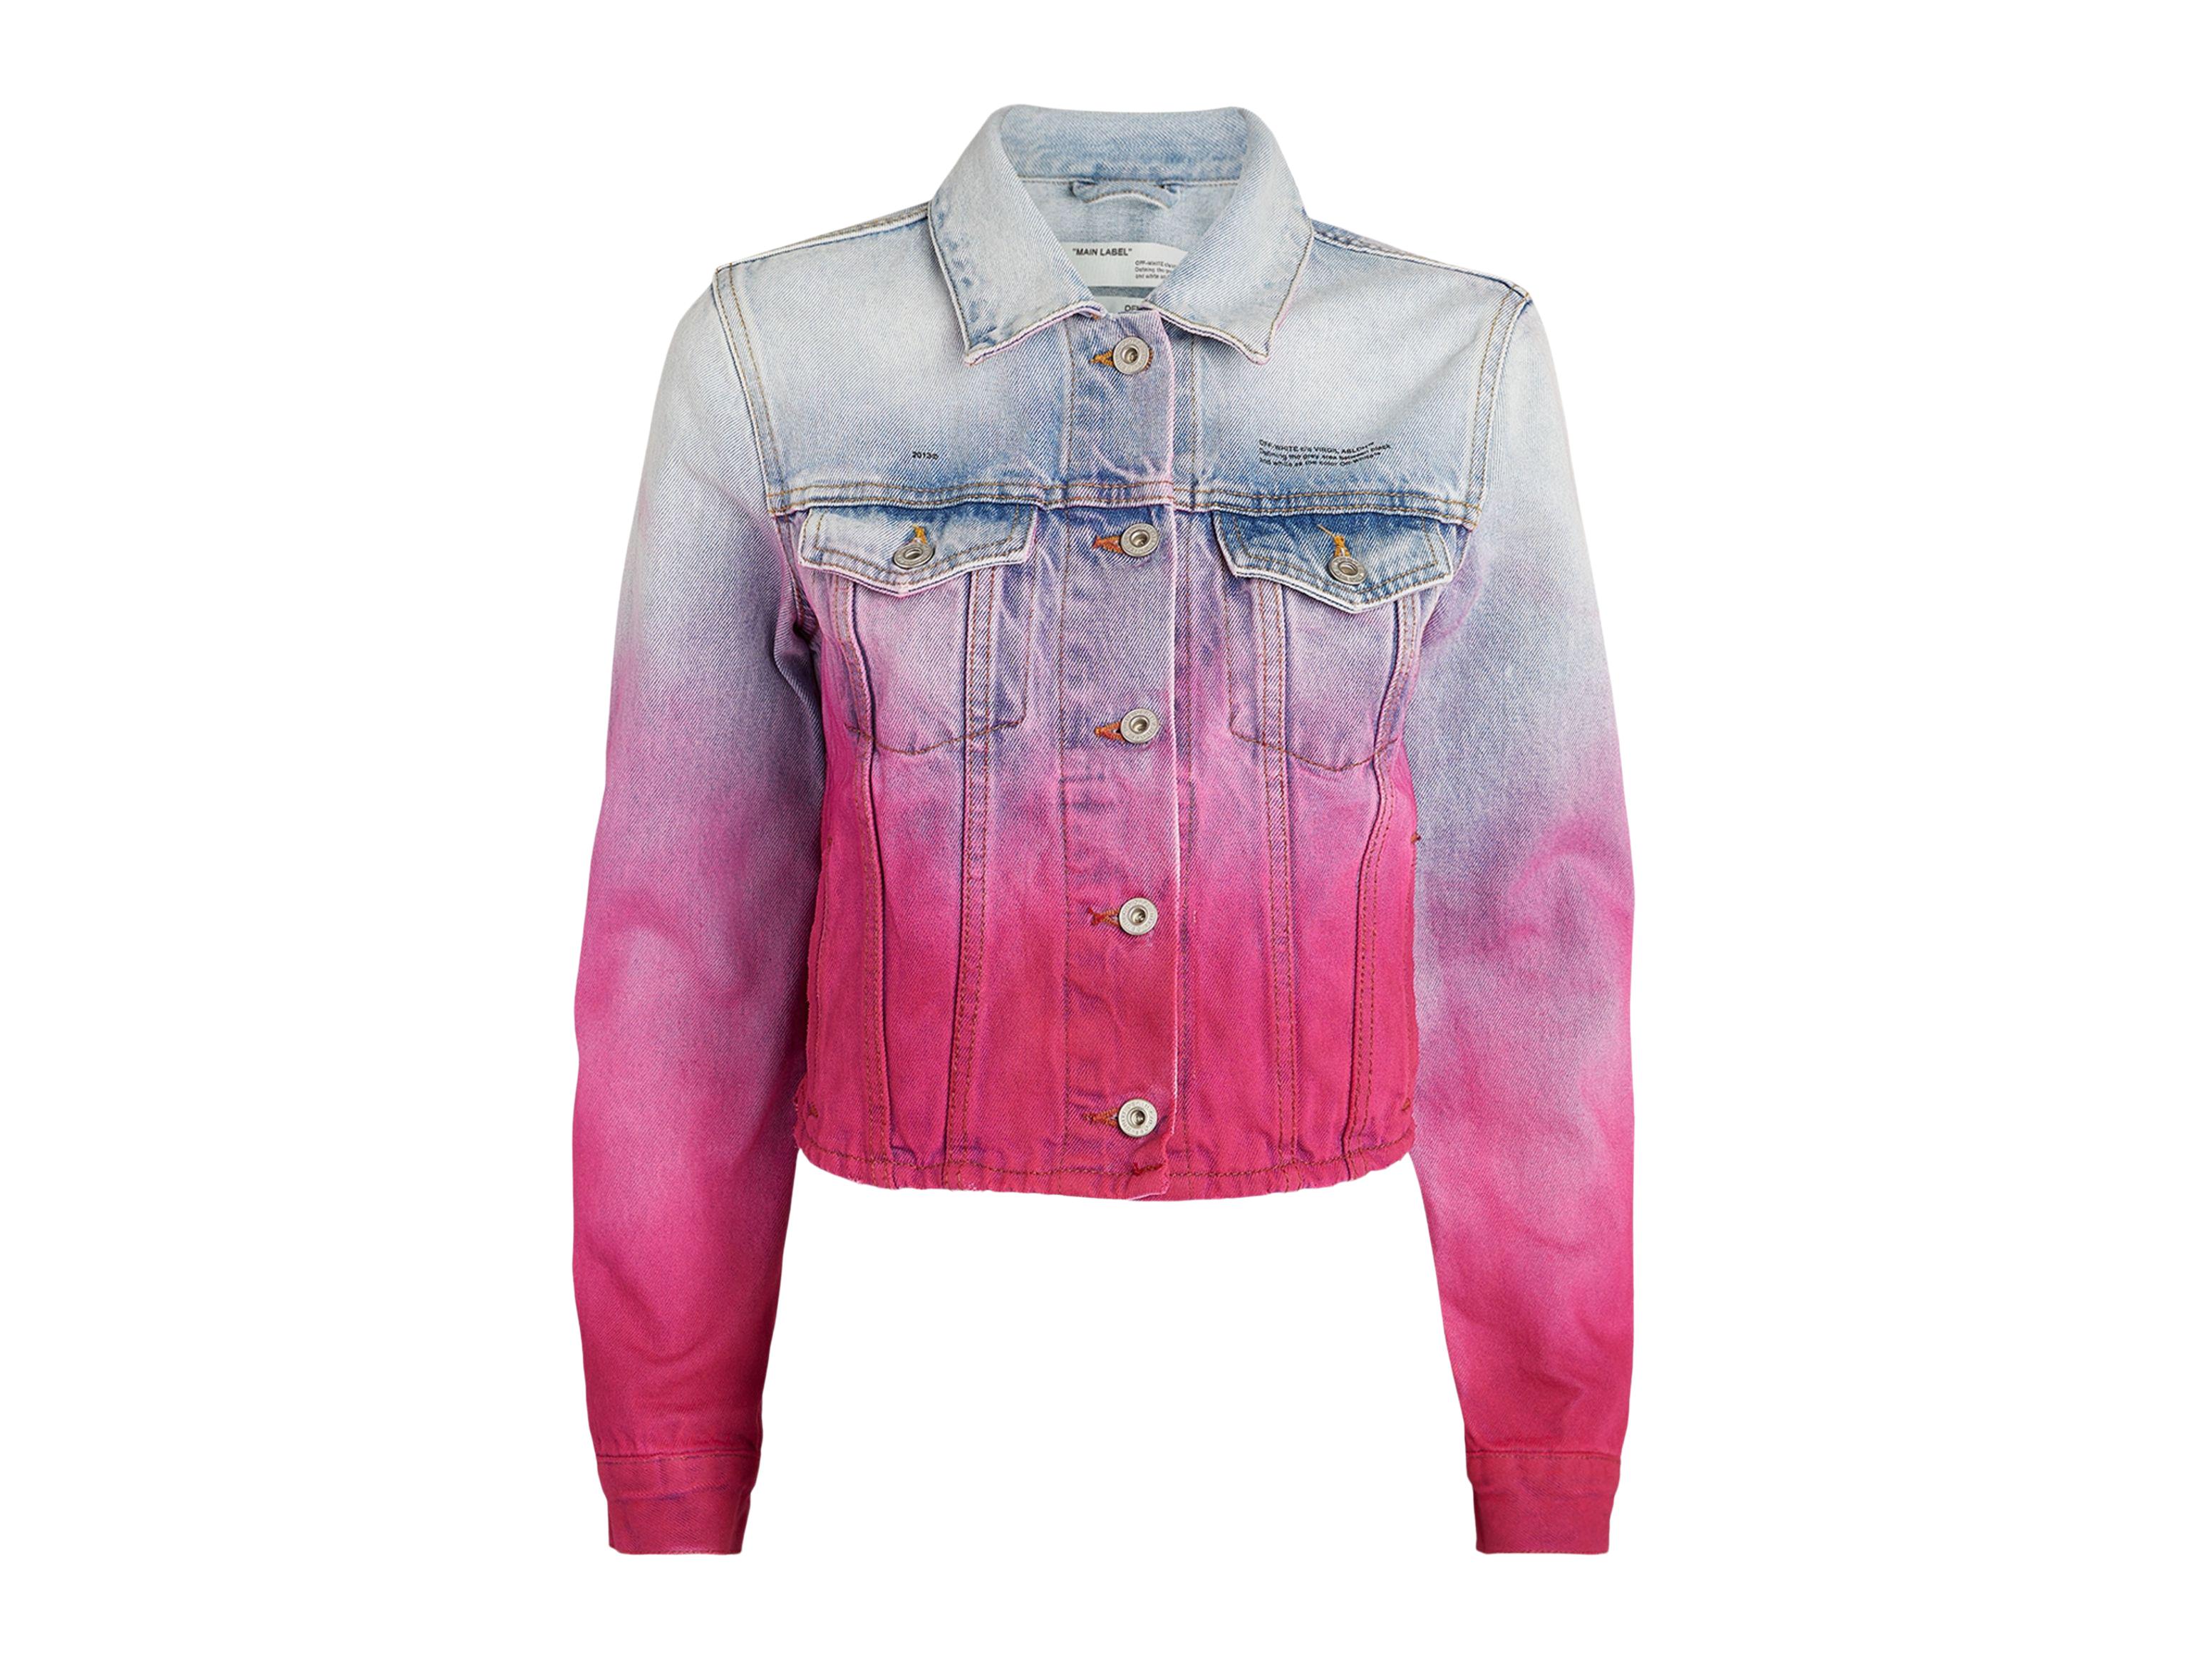 off white rose denim jacket